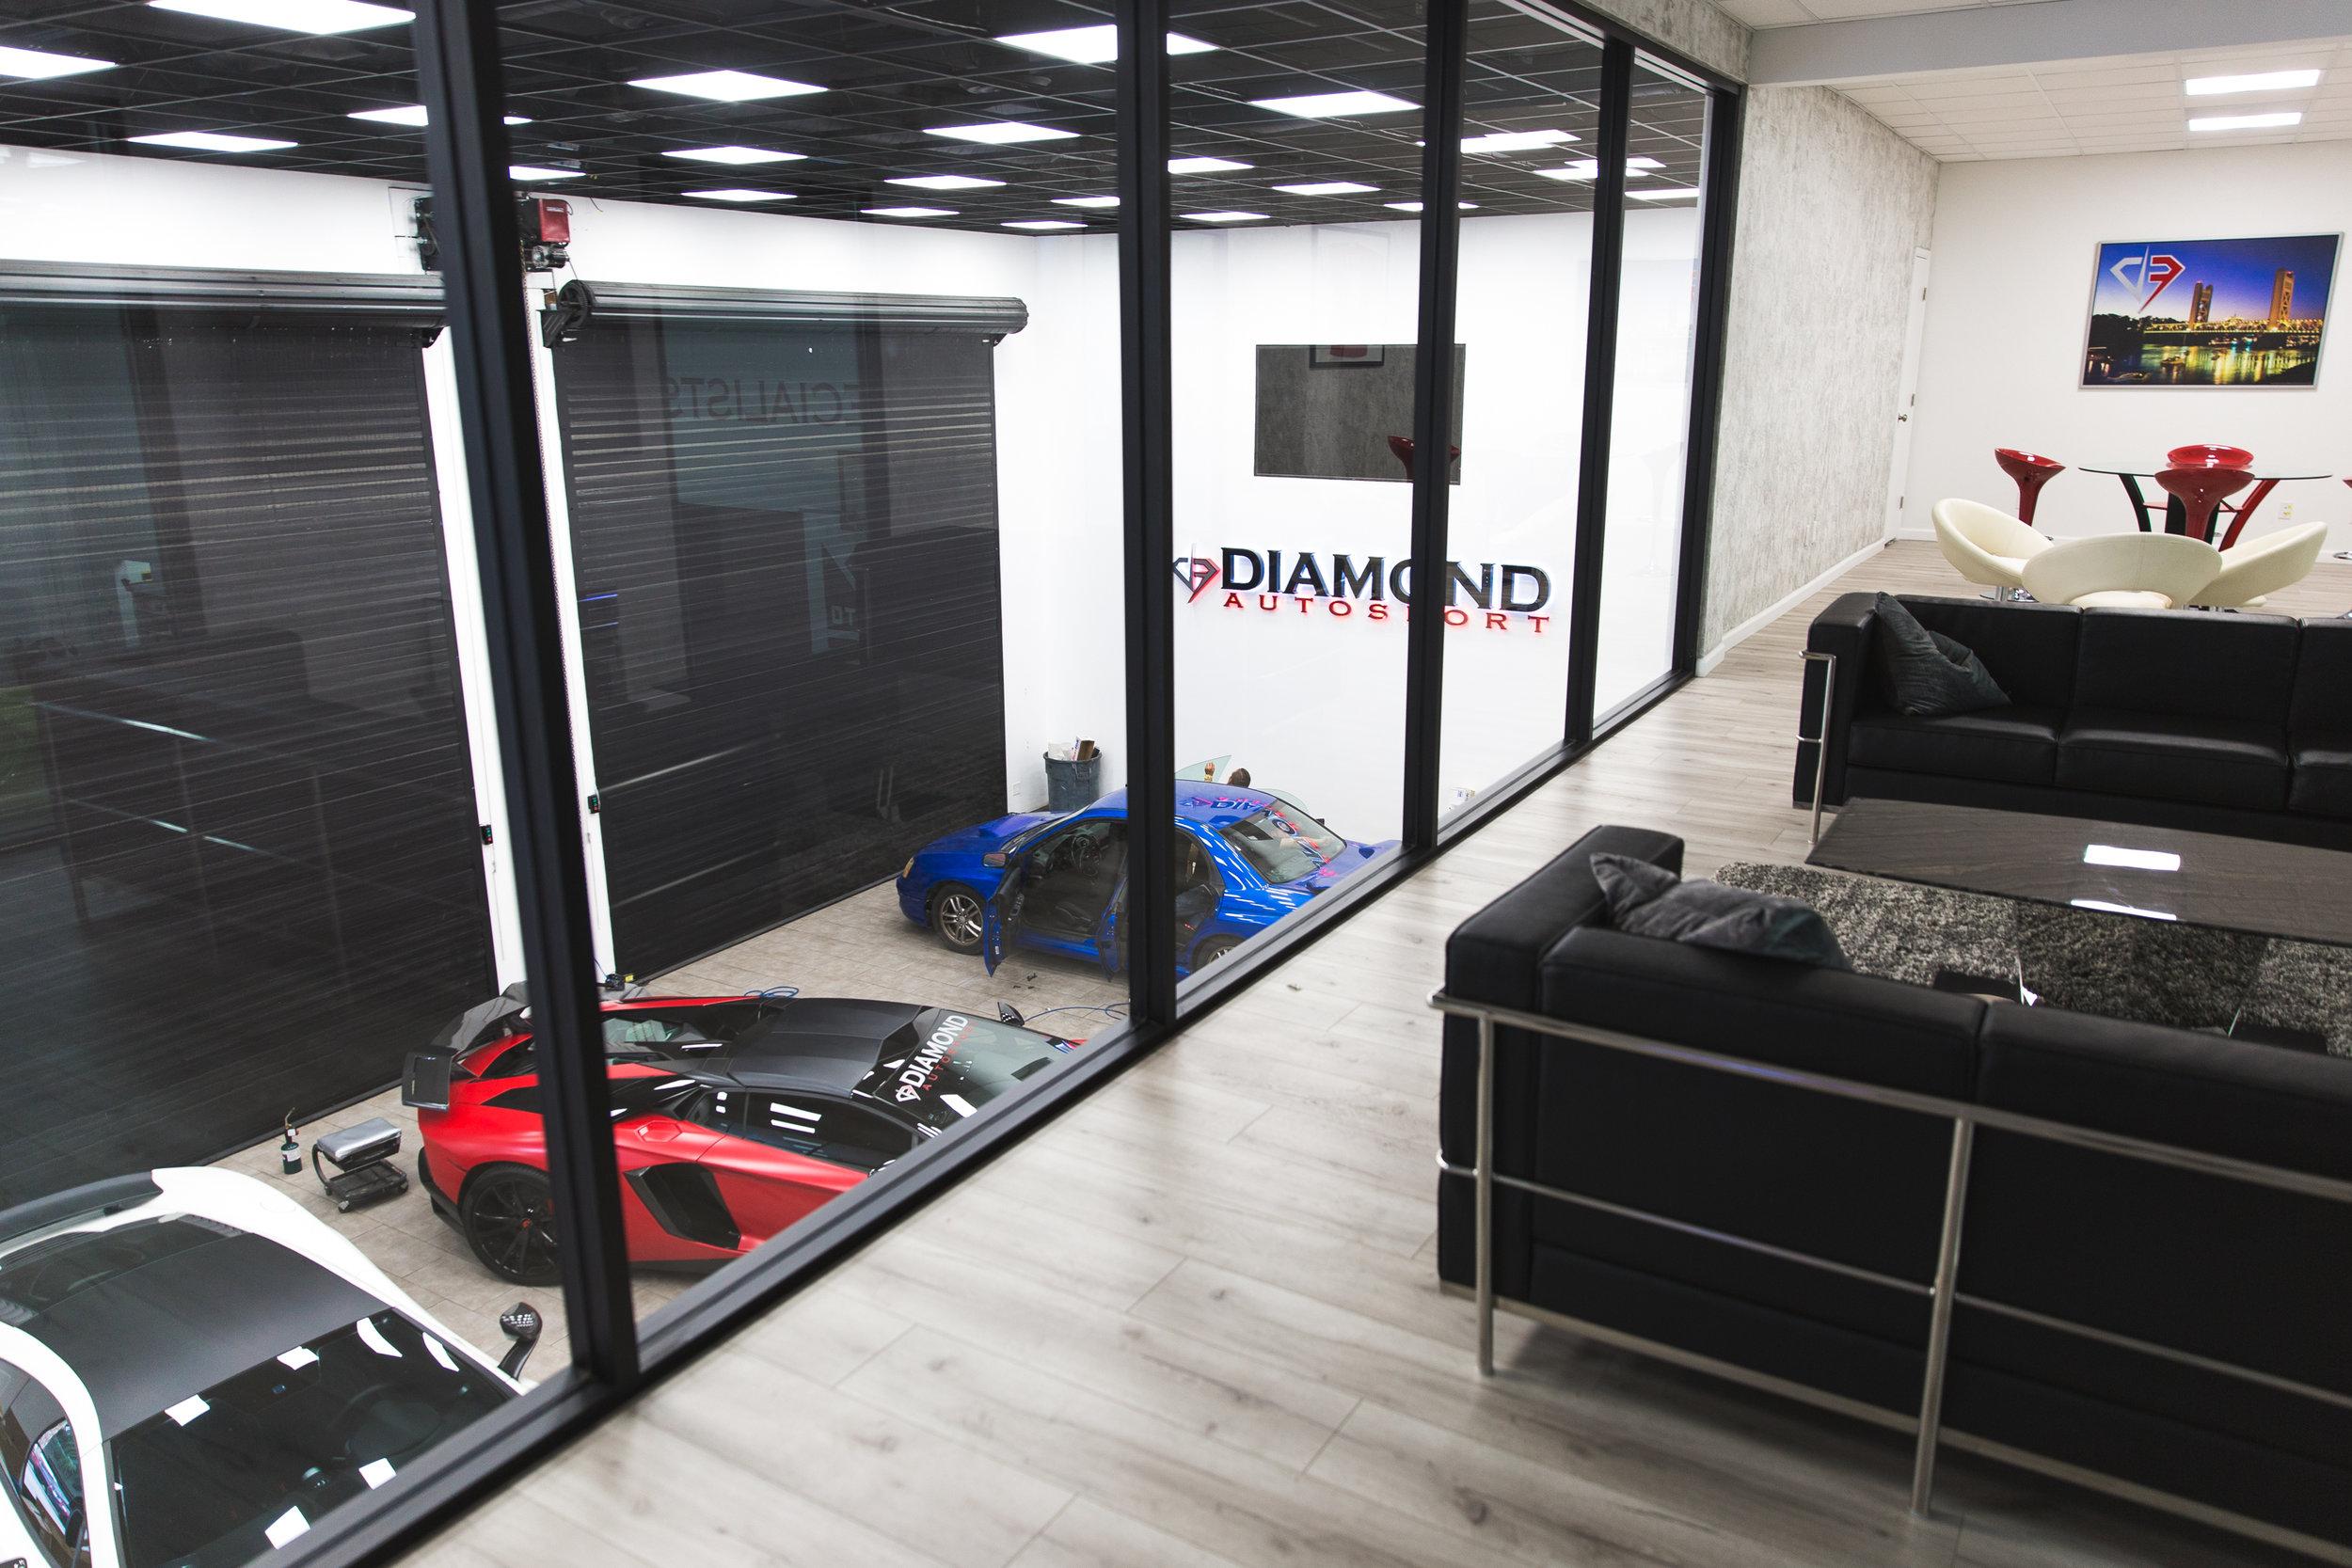 Stay_Driven_Sacramento_Diamond_Autosport-17.jpg